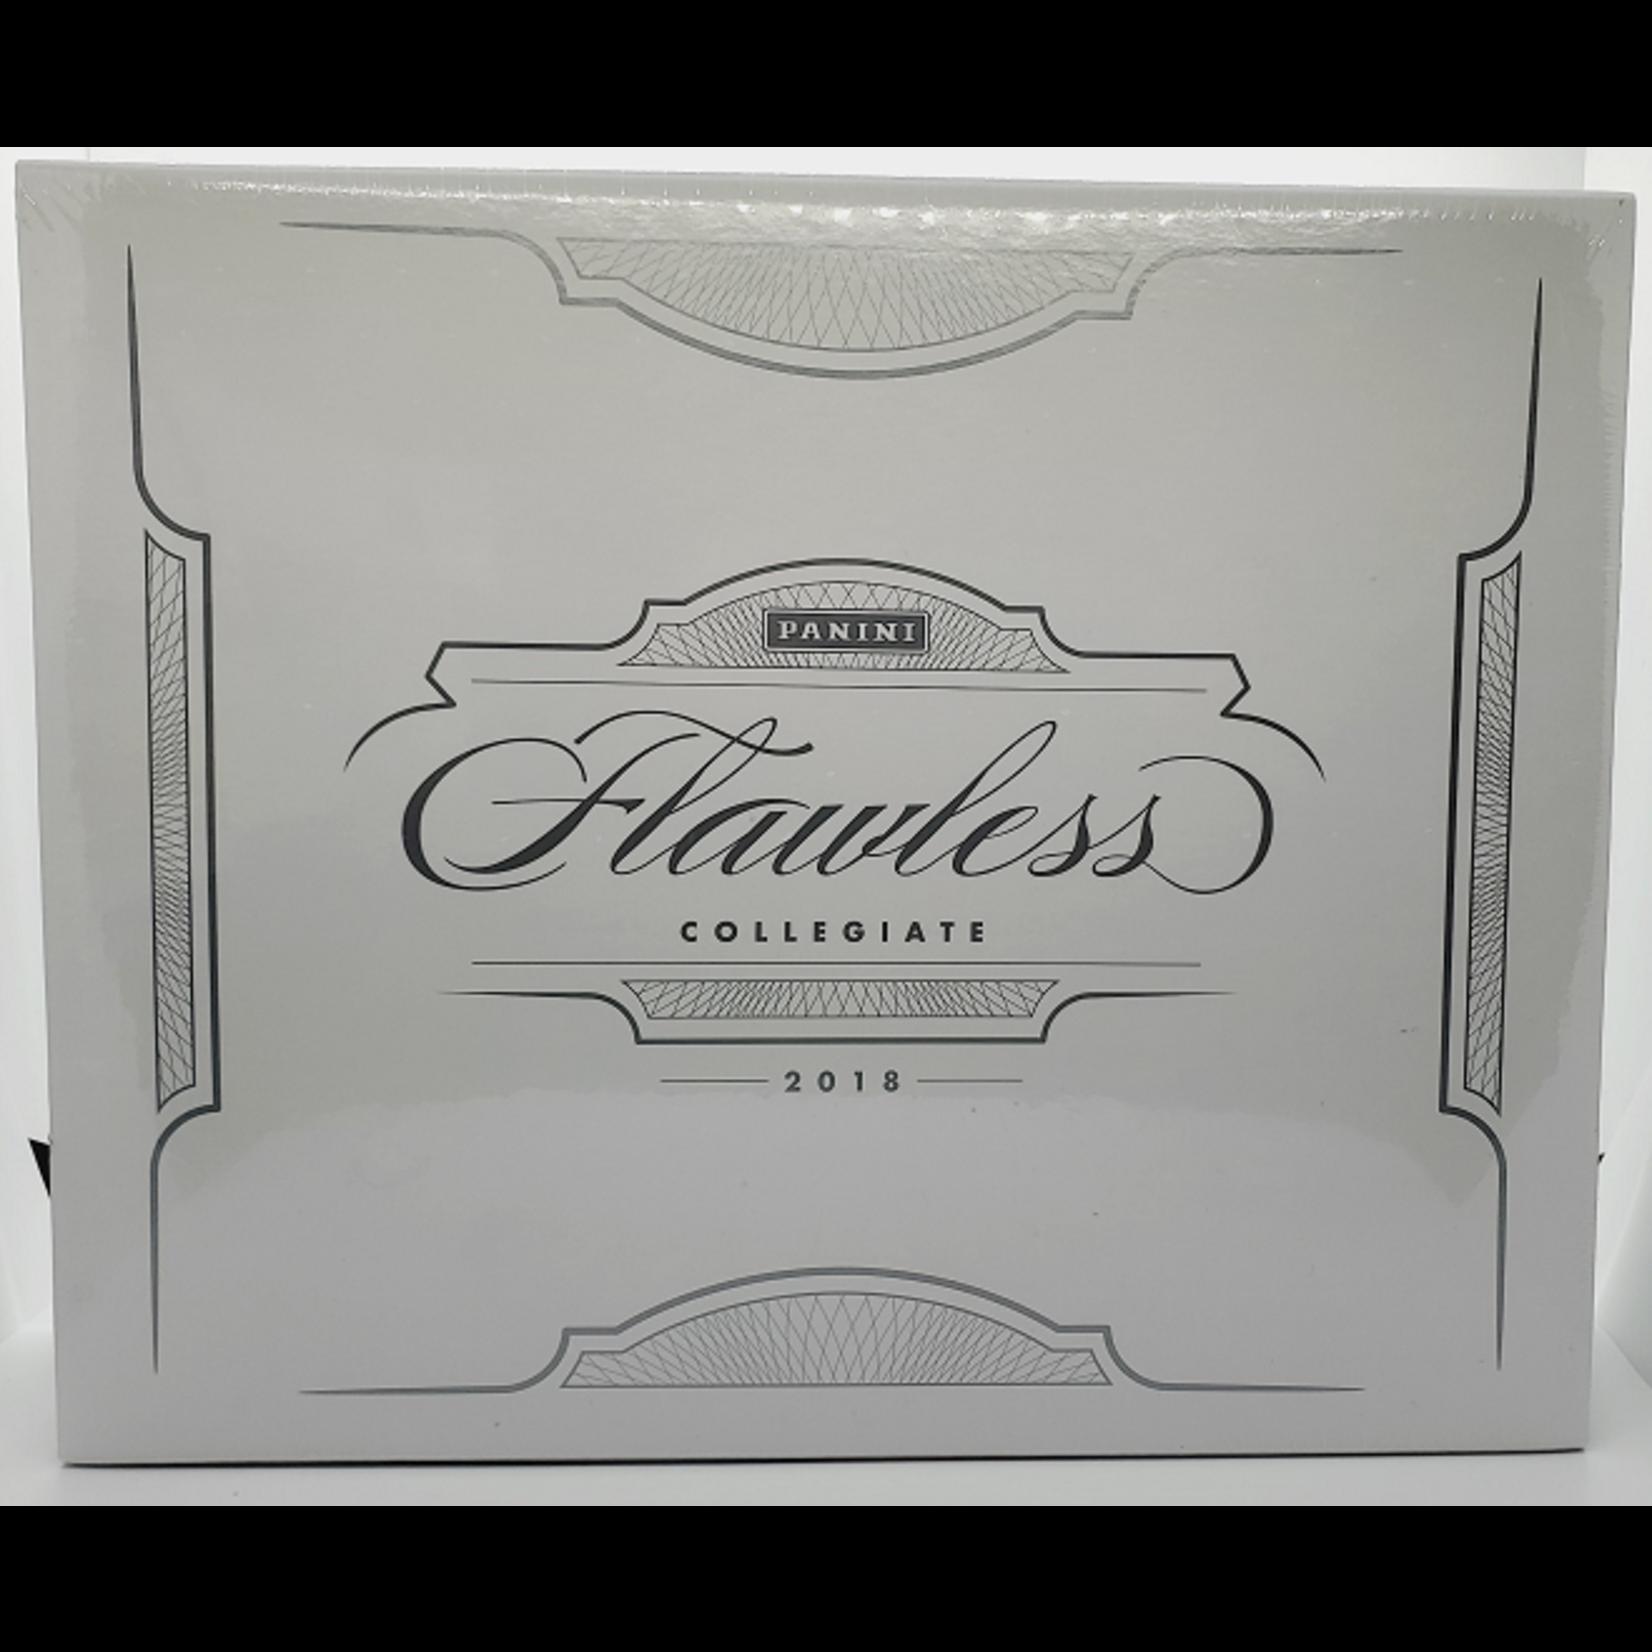 Panini America 2018-19 Panini Flawless Collegiate Basketball Hobby Box